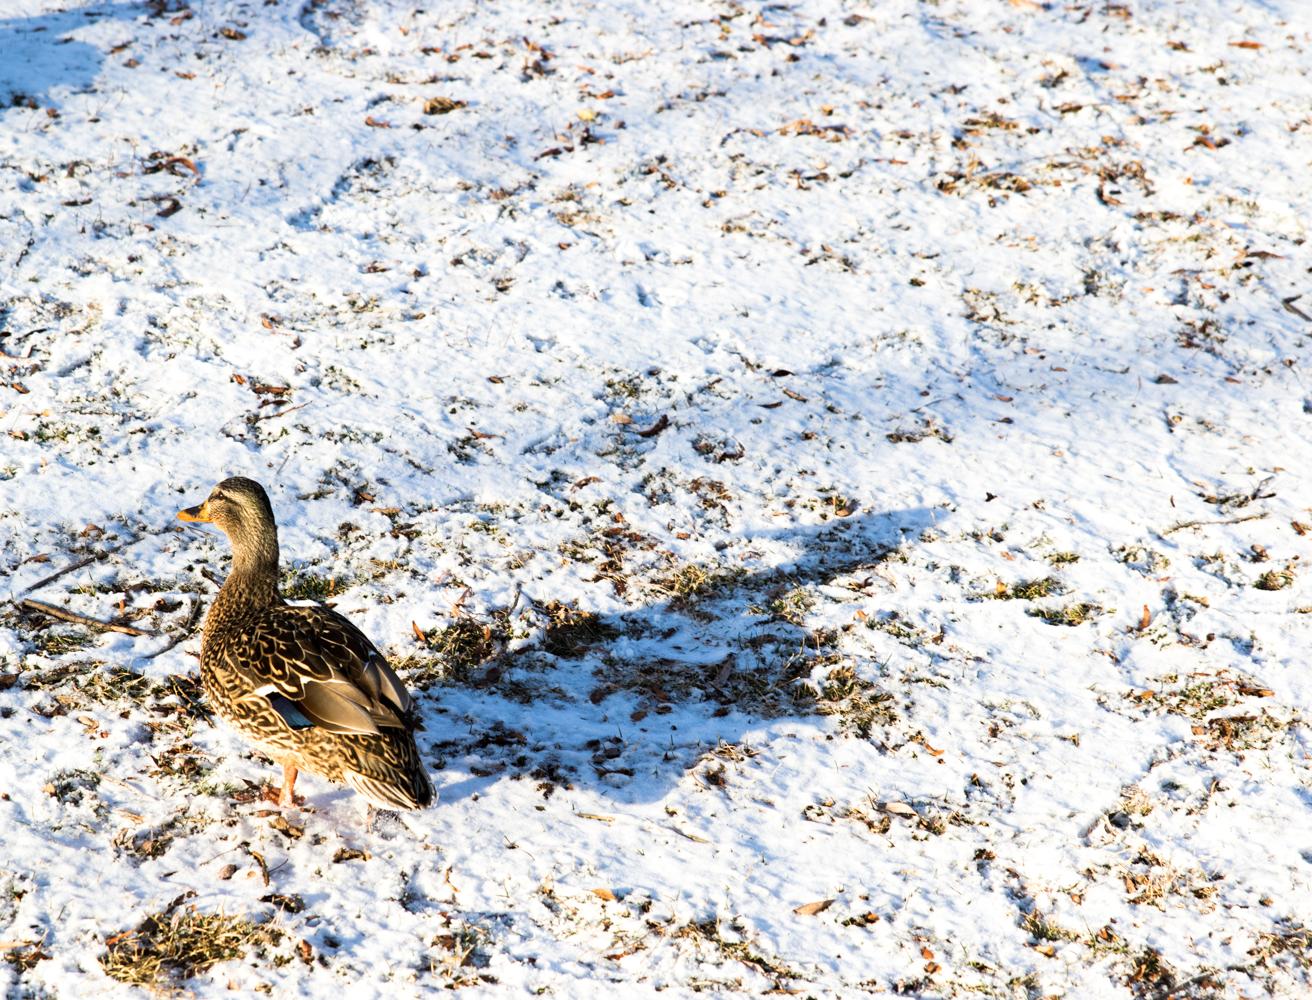 Duck enjoying the snow.